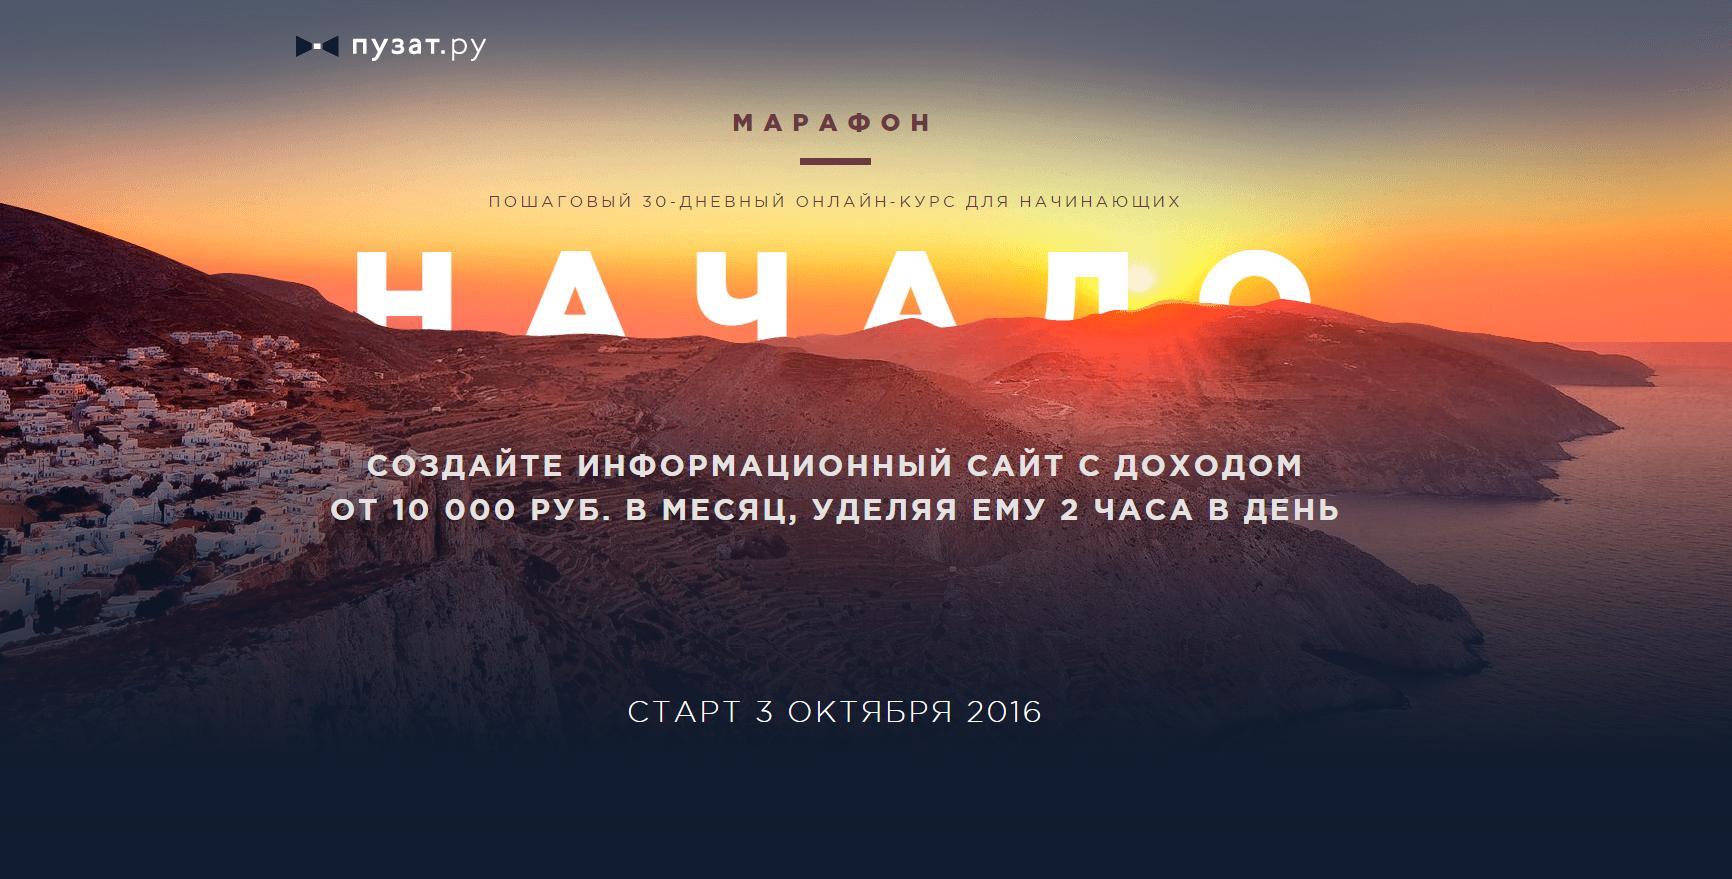 roman-puzat-marafon-nachalo-png.80994